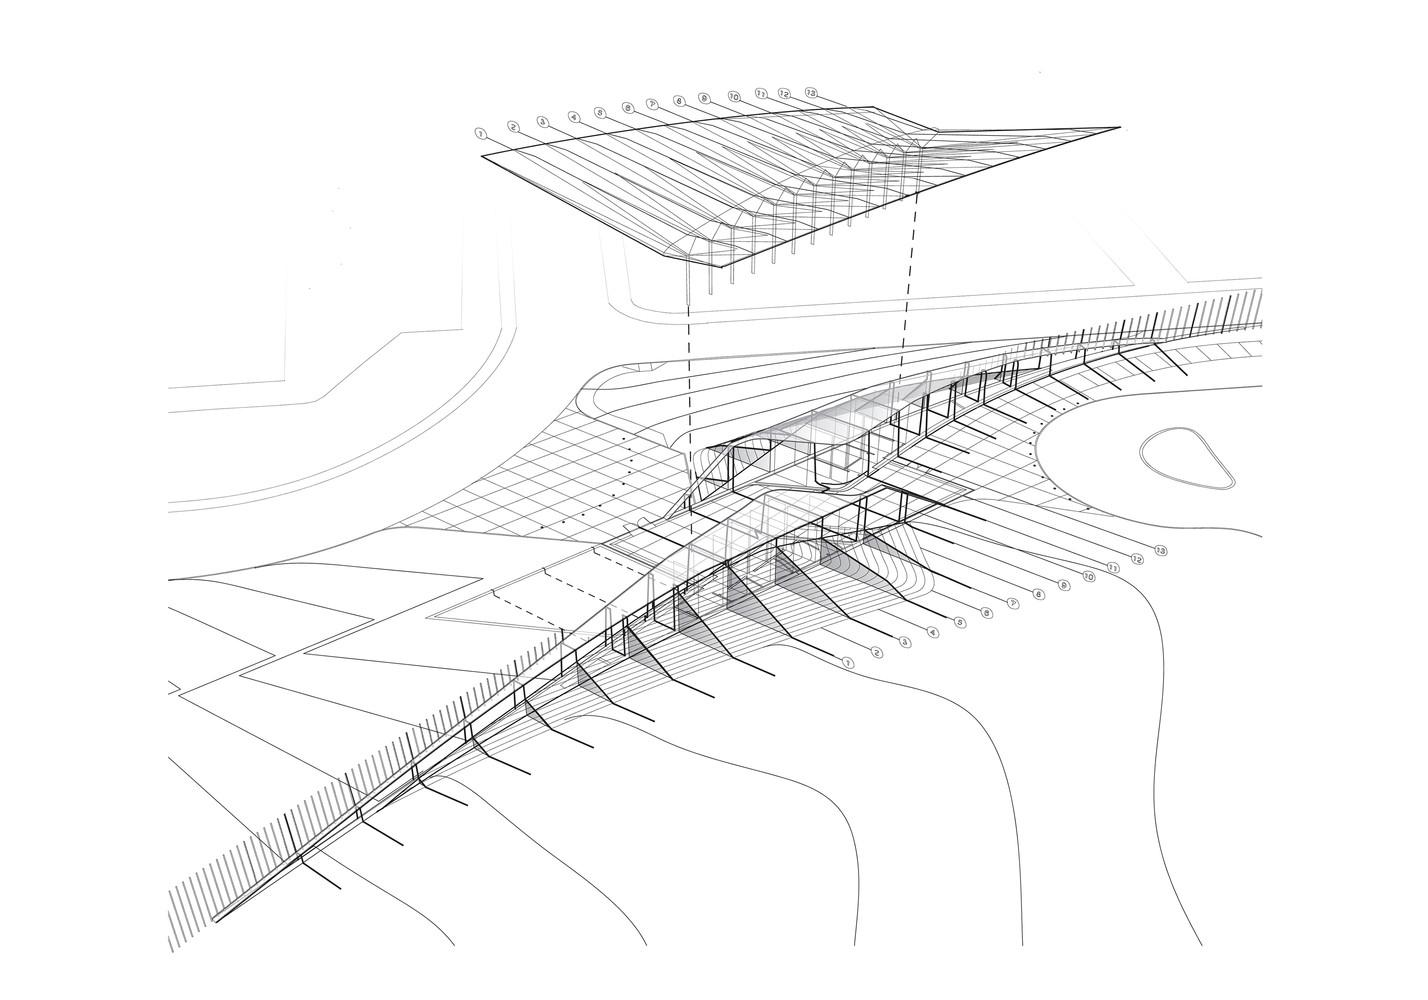 novartis campus weiss manfredi novartis visitor reception serial section diagram [ 1428 x 1000 Pixel ]